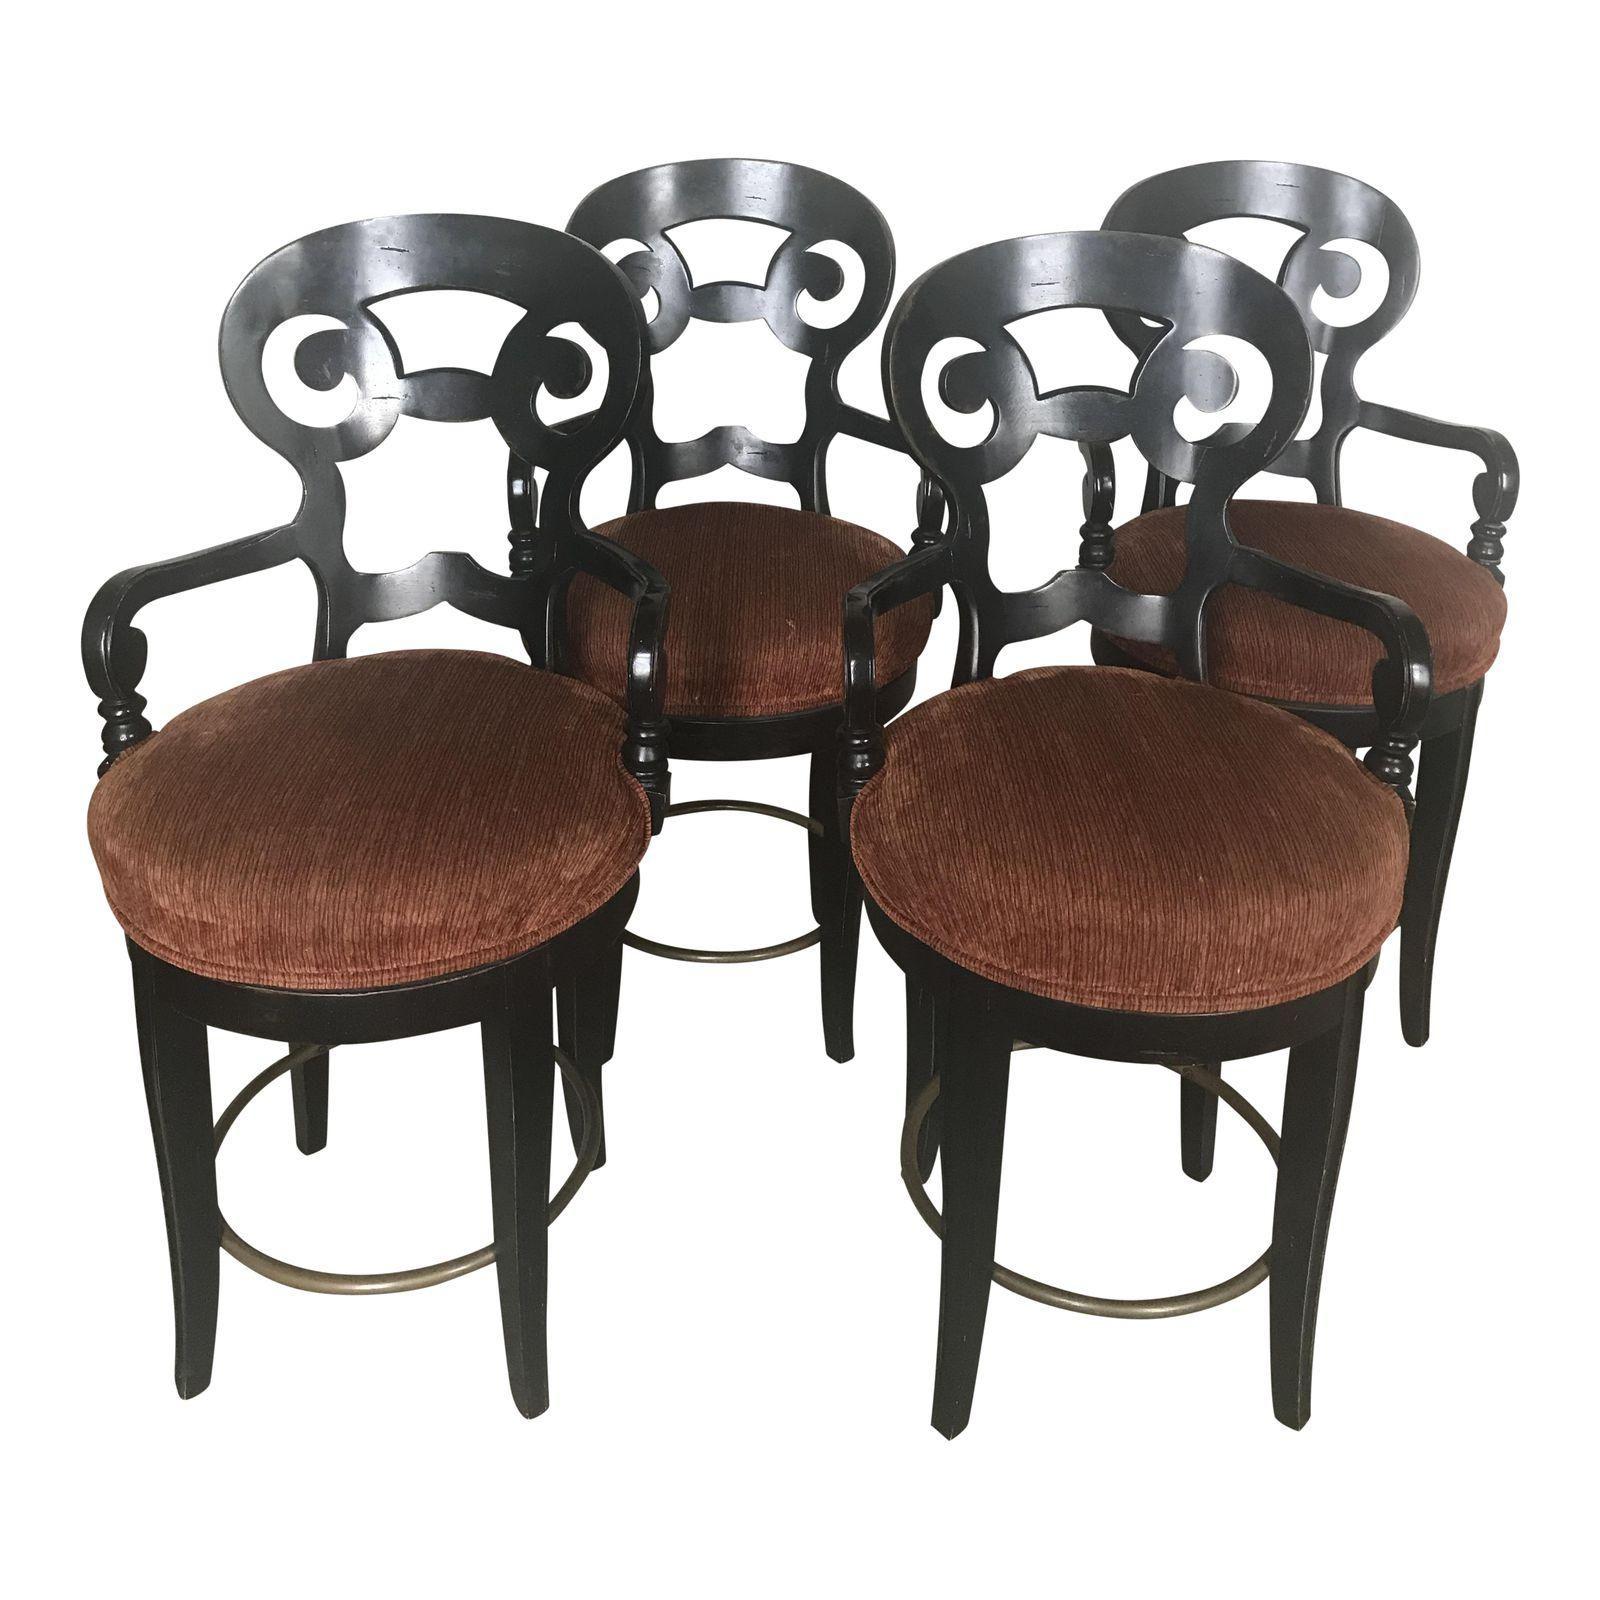 Century Furniture Swivel Counter Stools Set of 4